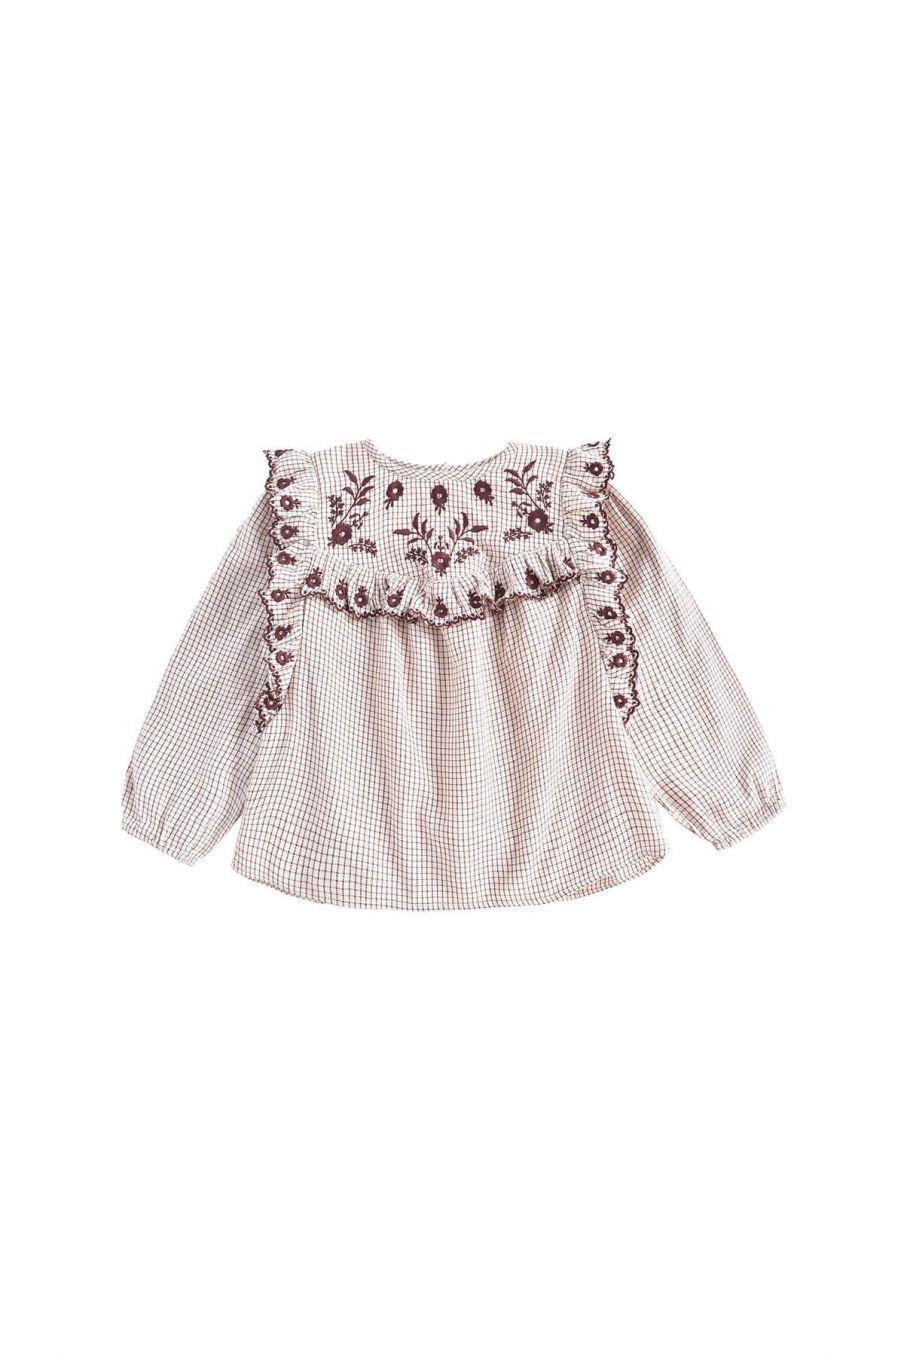 blouse fille abalone cream check - louise misha